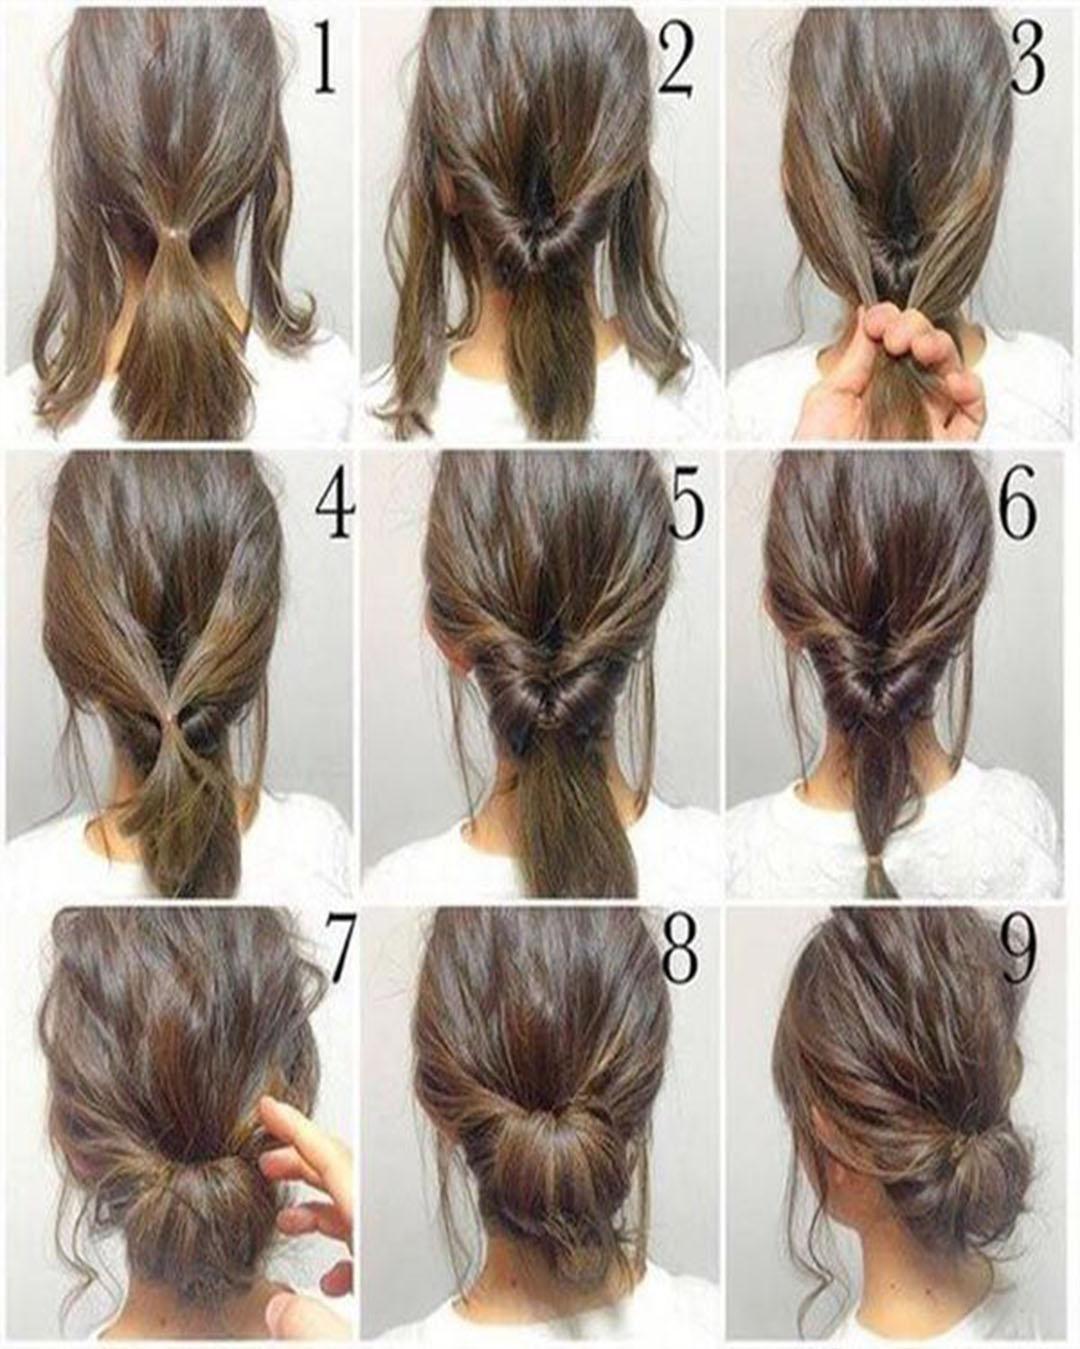 Easy winter hairstyles step by step original - Girlcheck